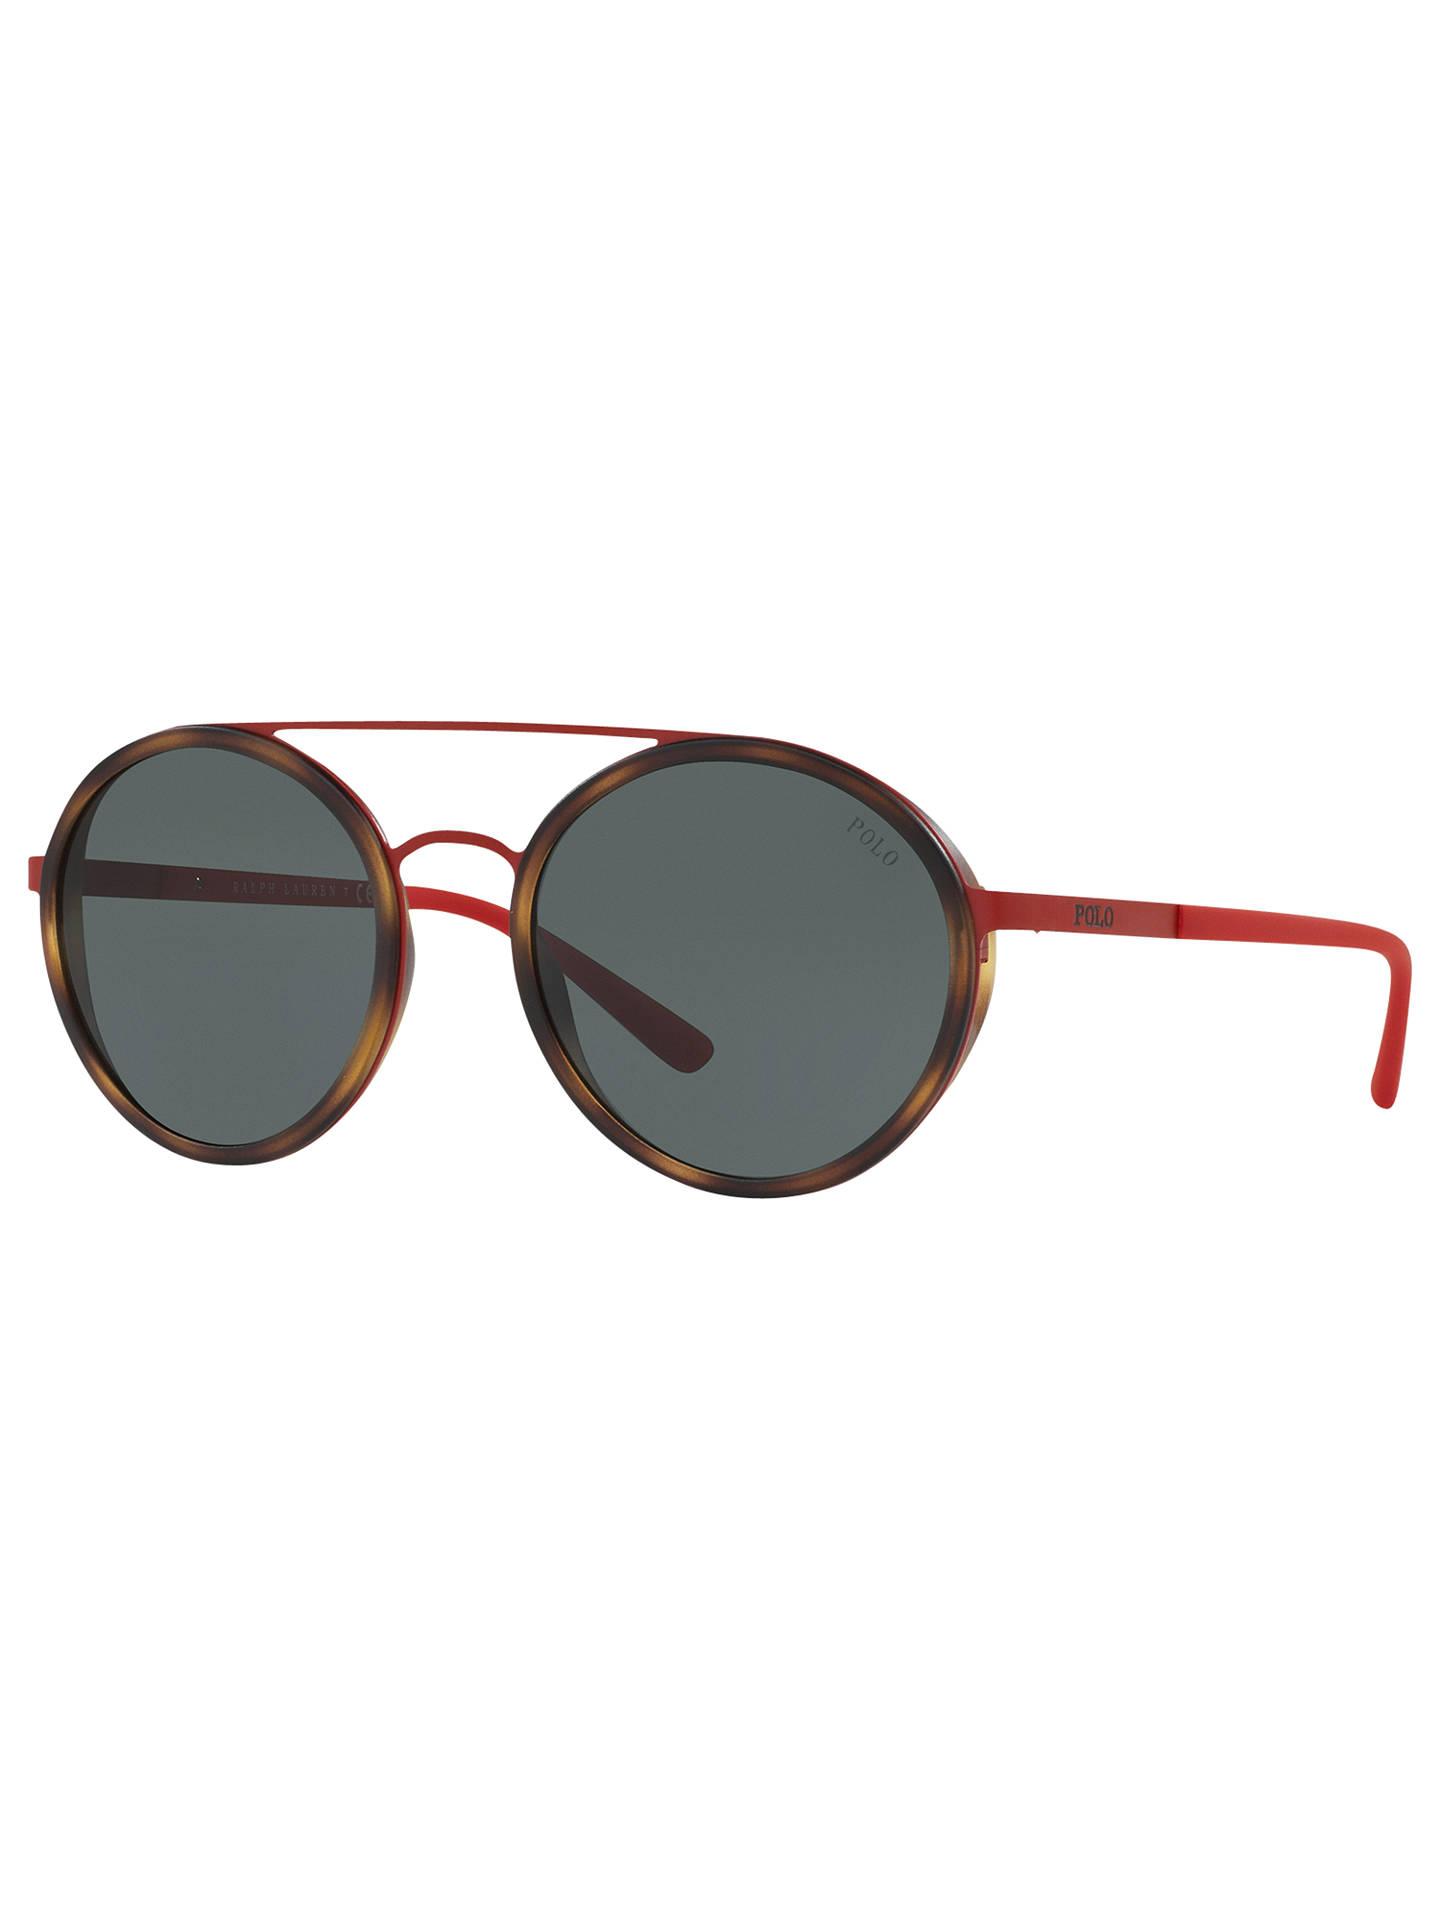 25cc23ed7 Buy Polo Ralph Lauren PH3103 Round Sunglasses, Red Online at johnlewis.com  ...